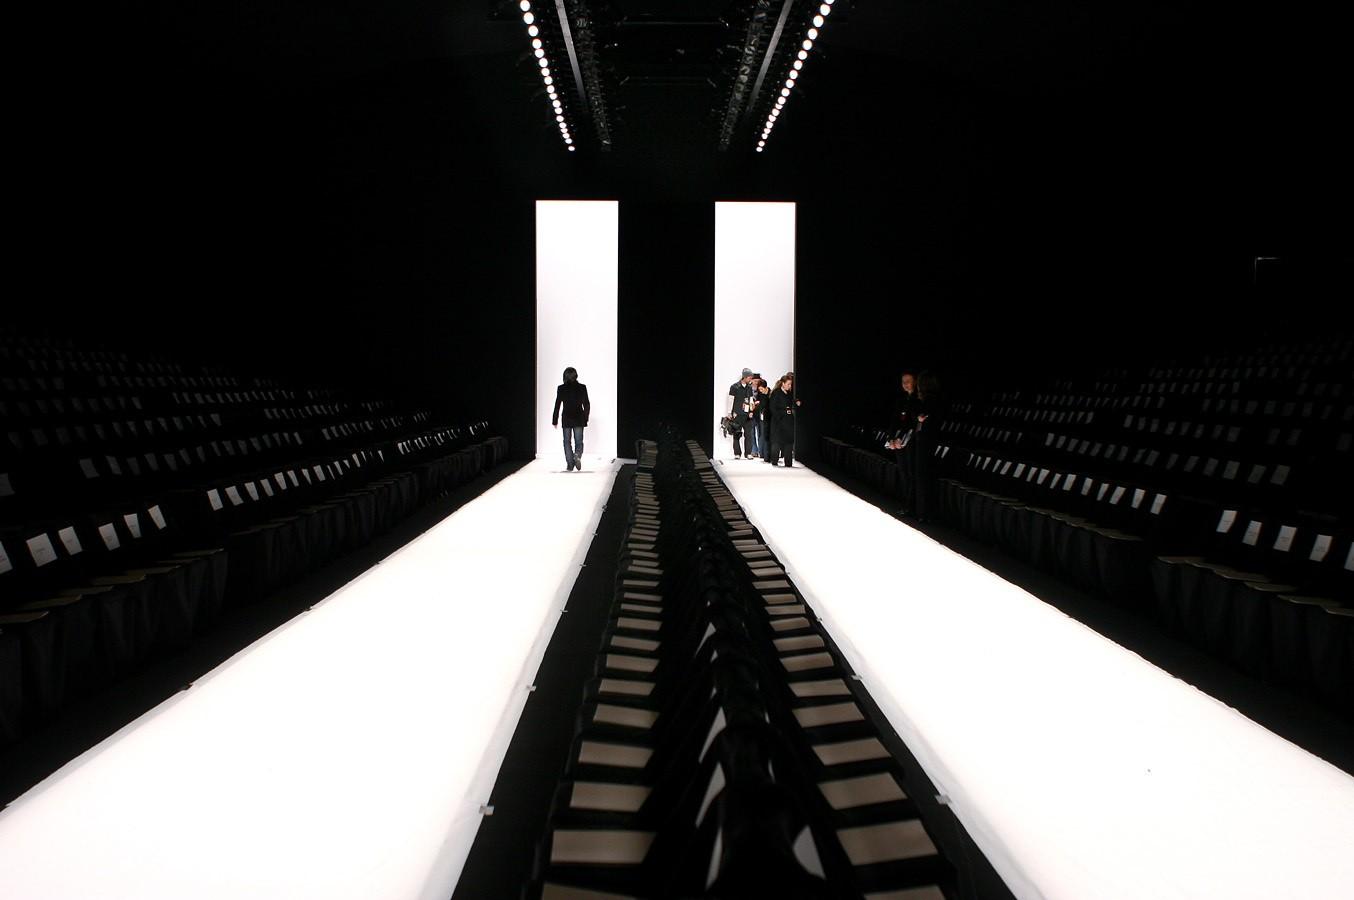 1r1kors_runway_preshow